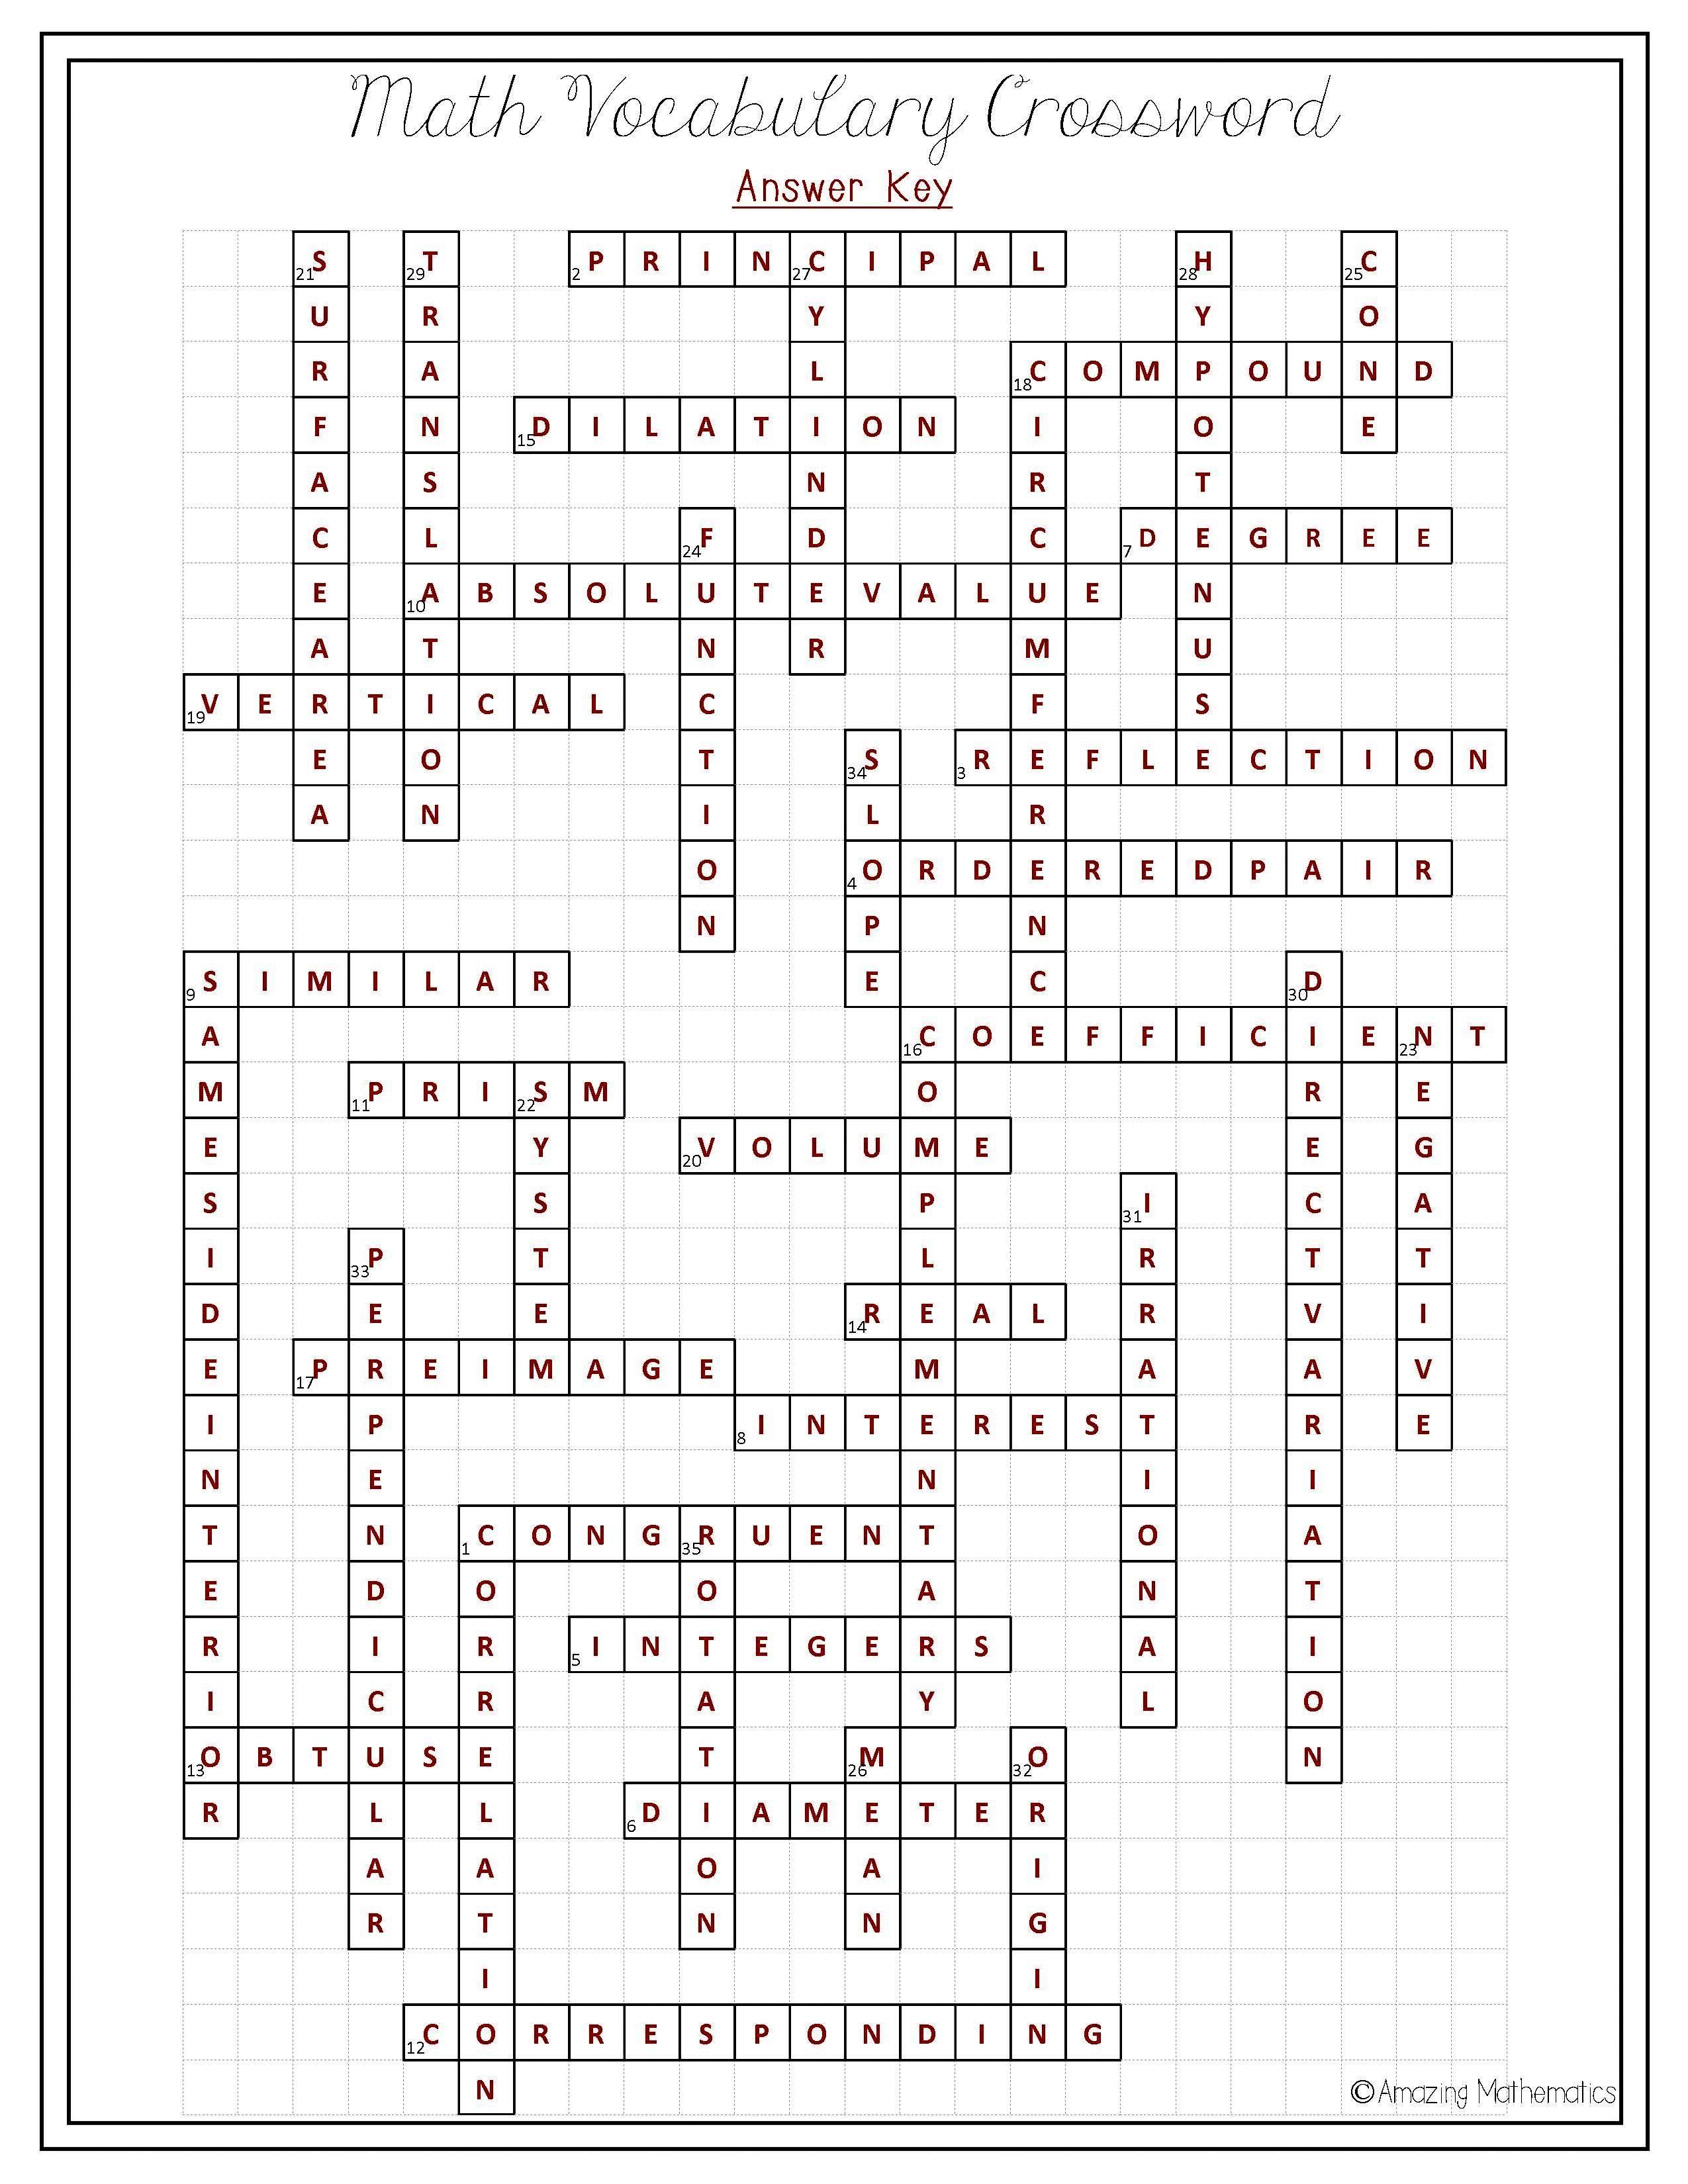 8Th Grade Math Vocabulary Crossword | Puzzles | Math Vocabulary, 8Th - Printable Math Vocabulary Crossword Puzzles